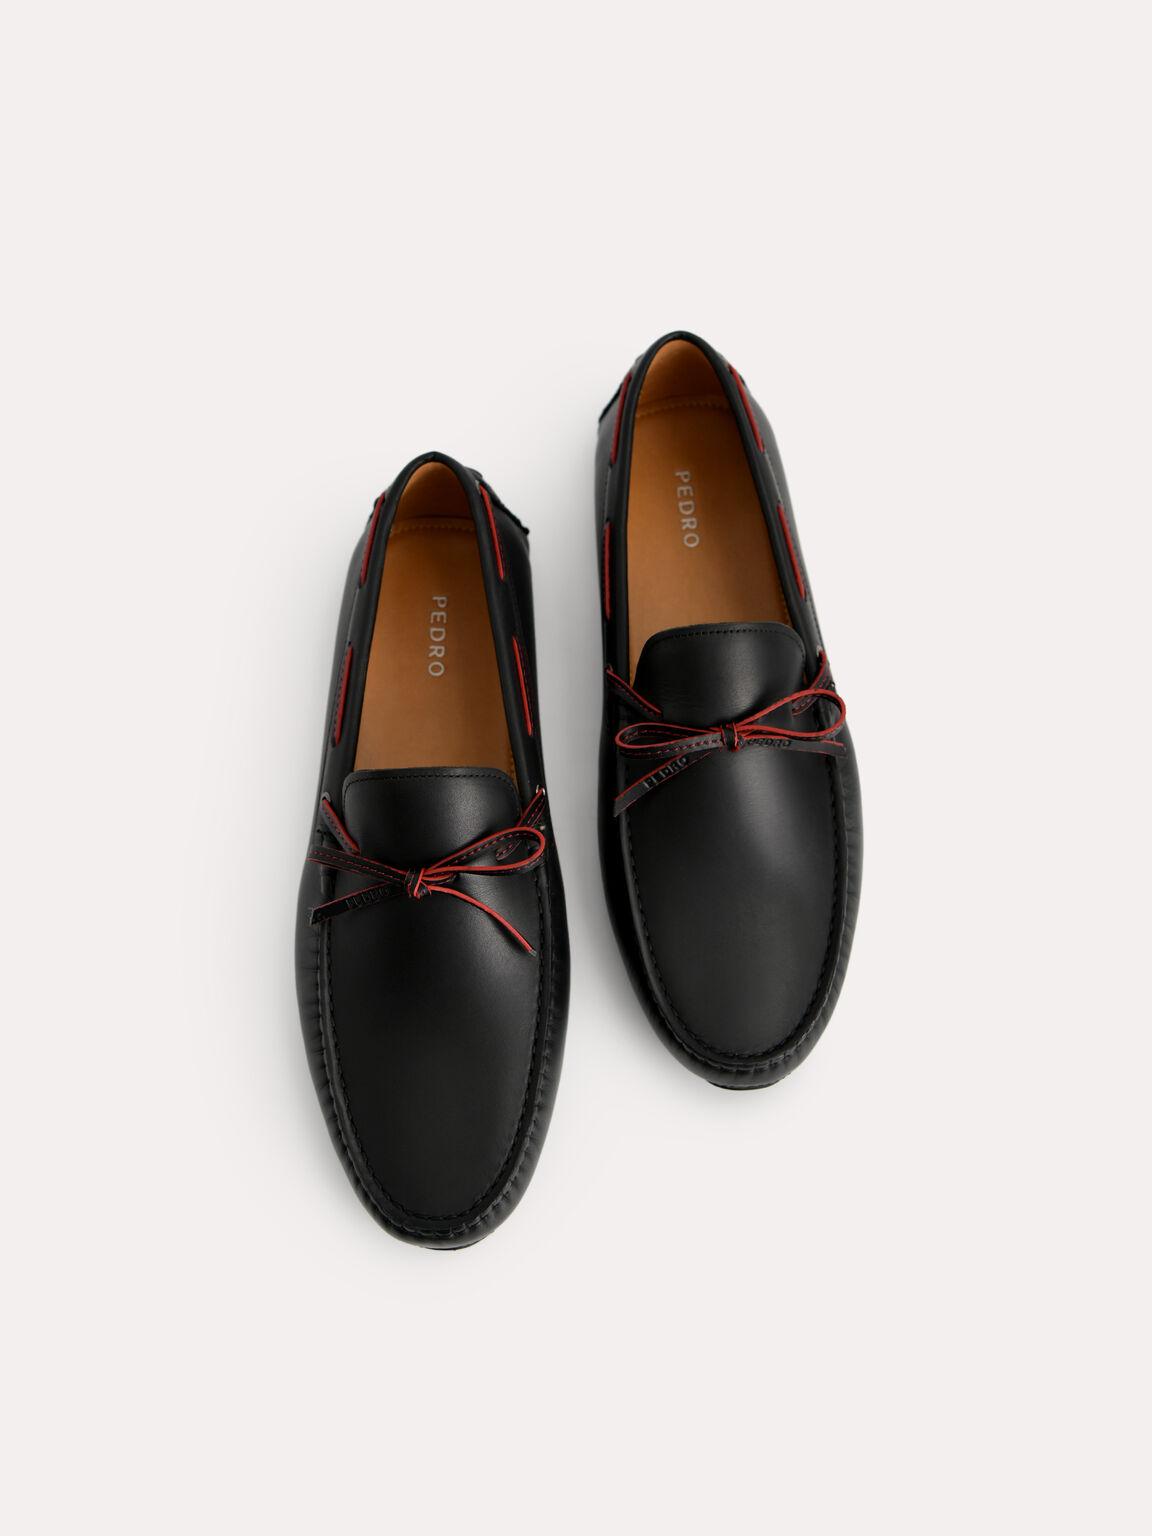 Bow-Detailed Leather Moccasins, Black, hi-res